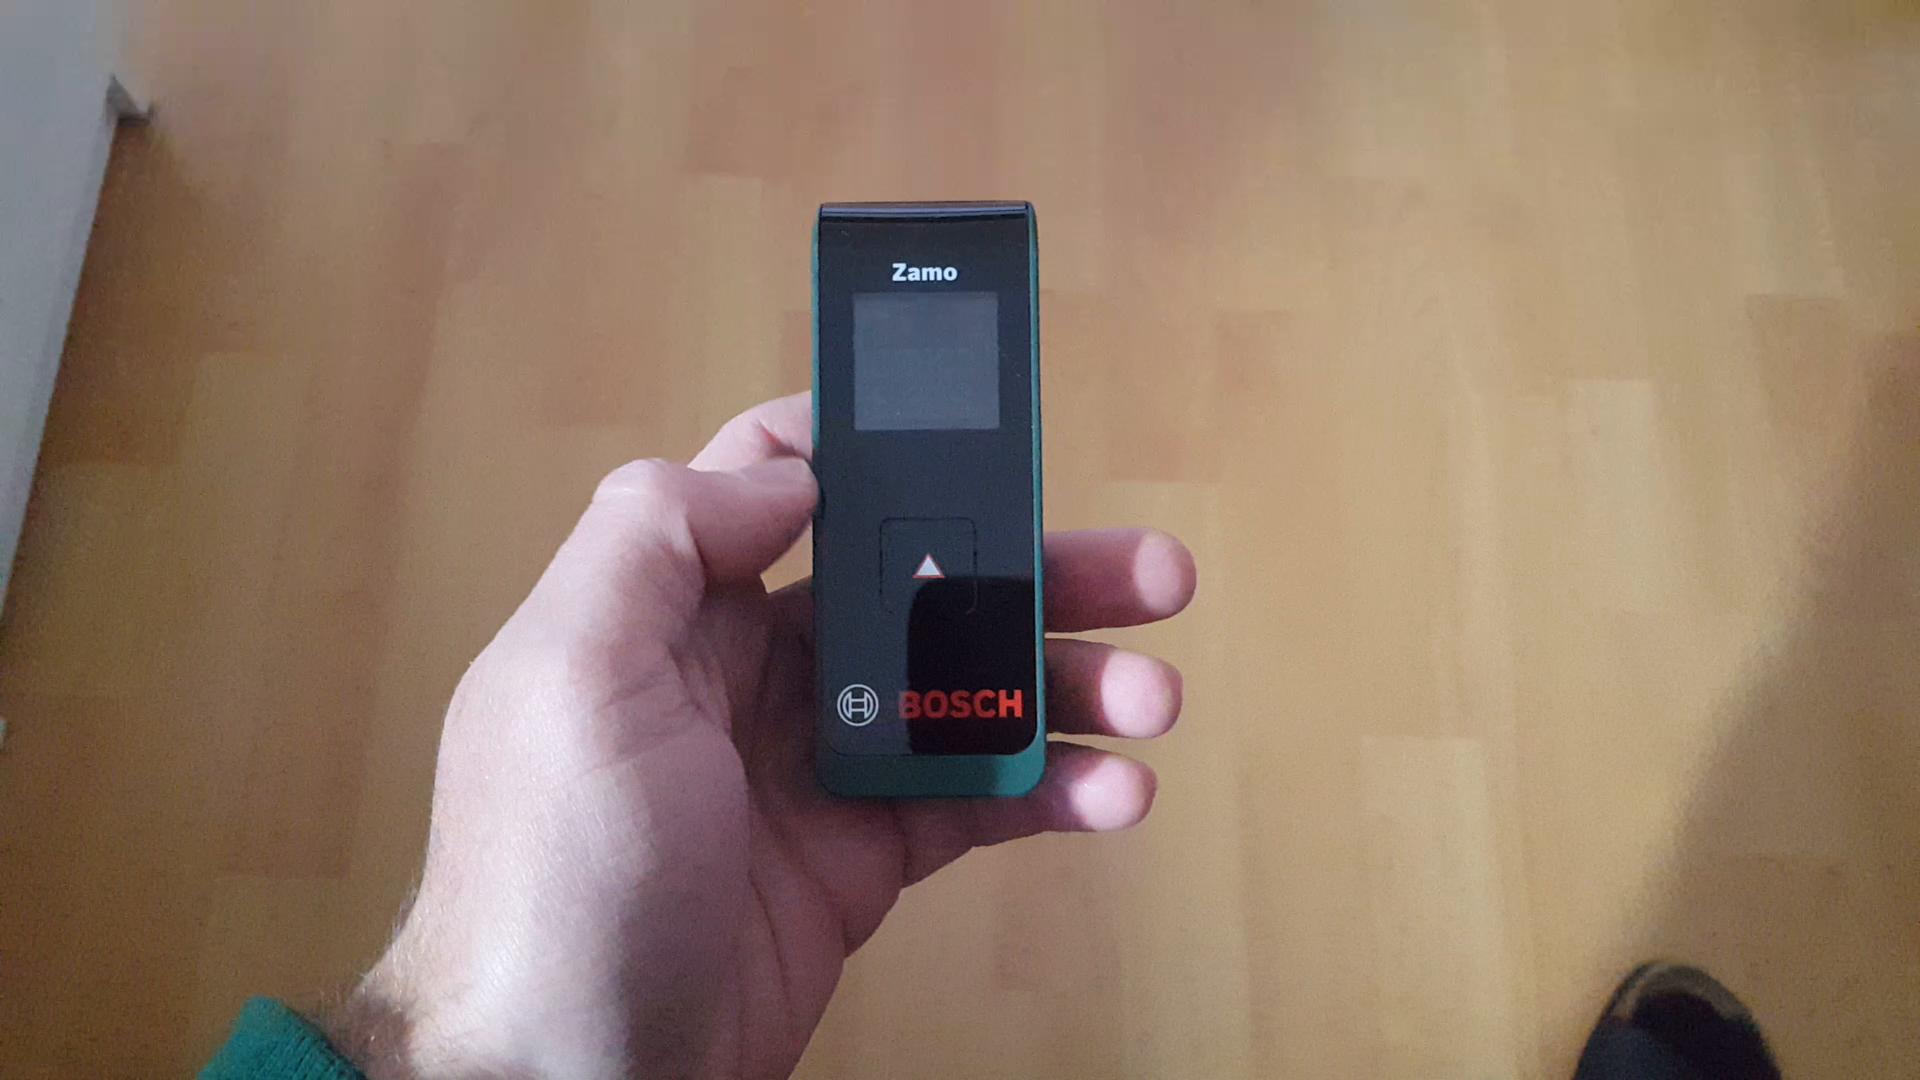 Bosch Laser Entfernungsmesser Zamo Ii : Bosch diy digitaler laser entfernungsmesser zamo: